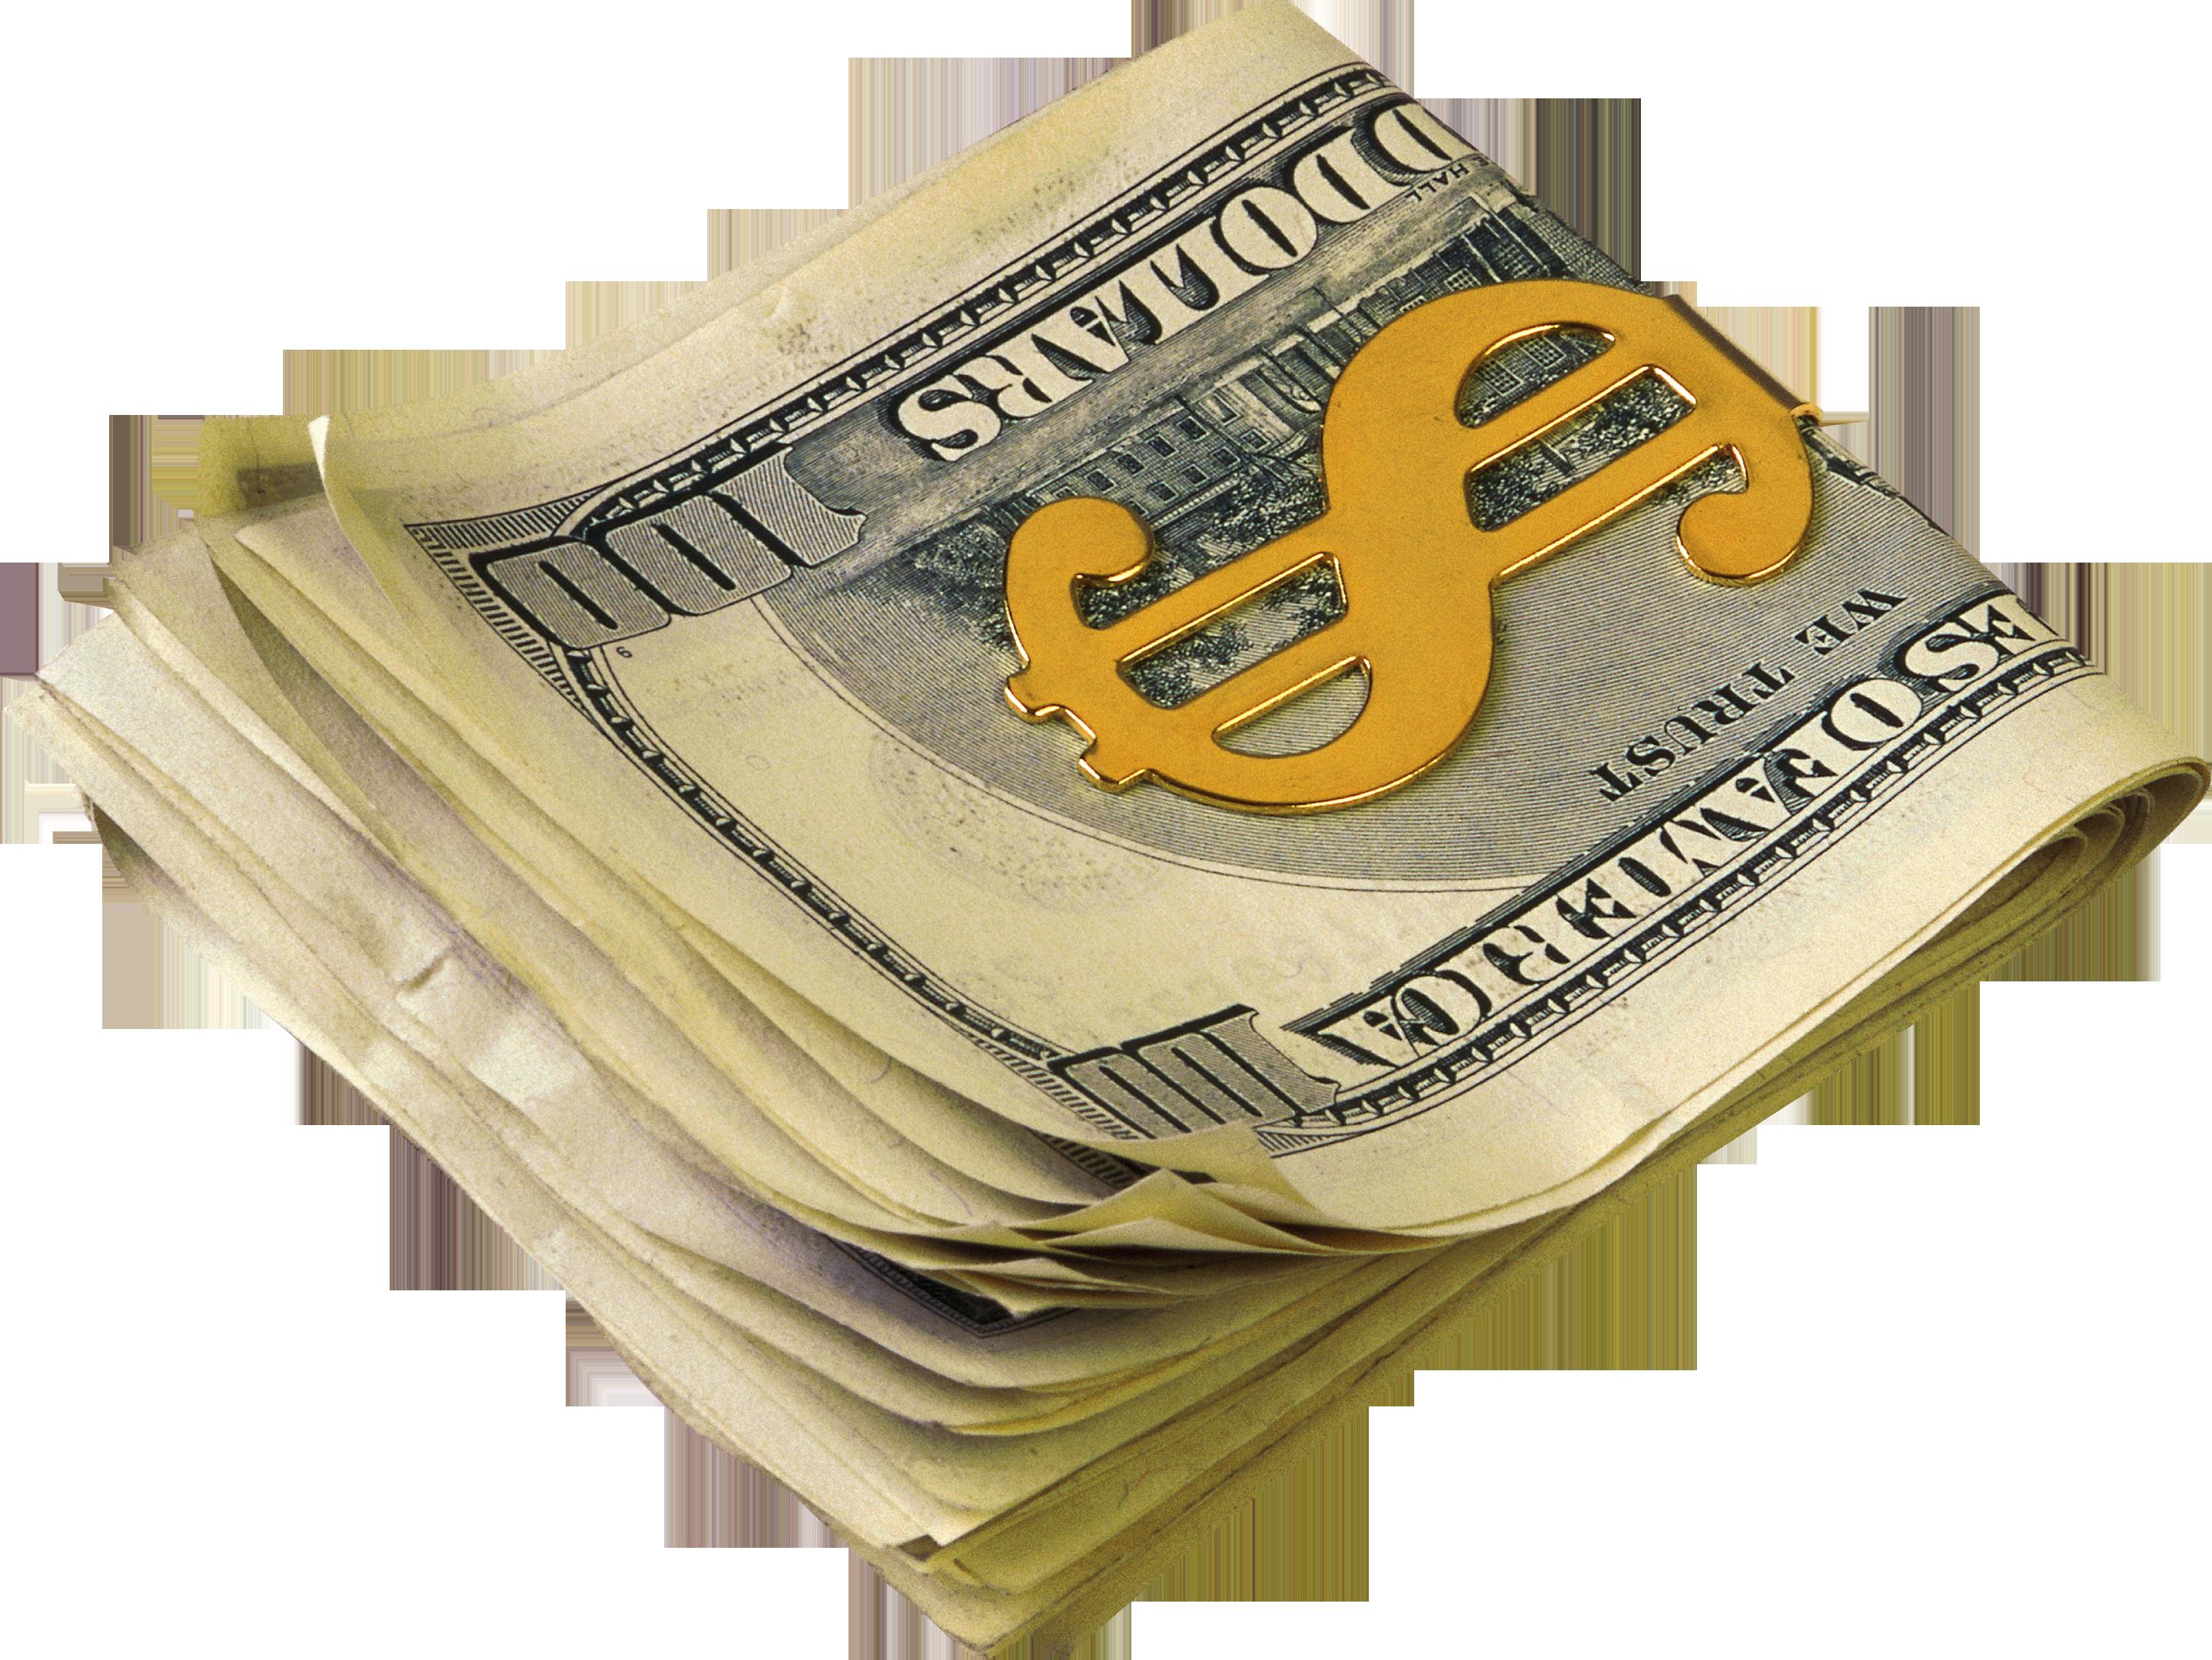 Money Png Image - Money, Transparent background PNG HD thumbnail